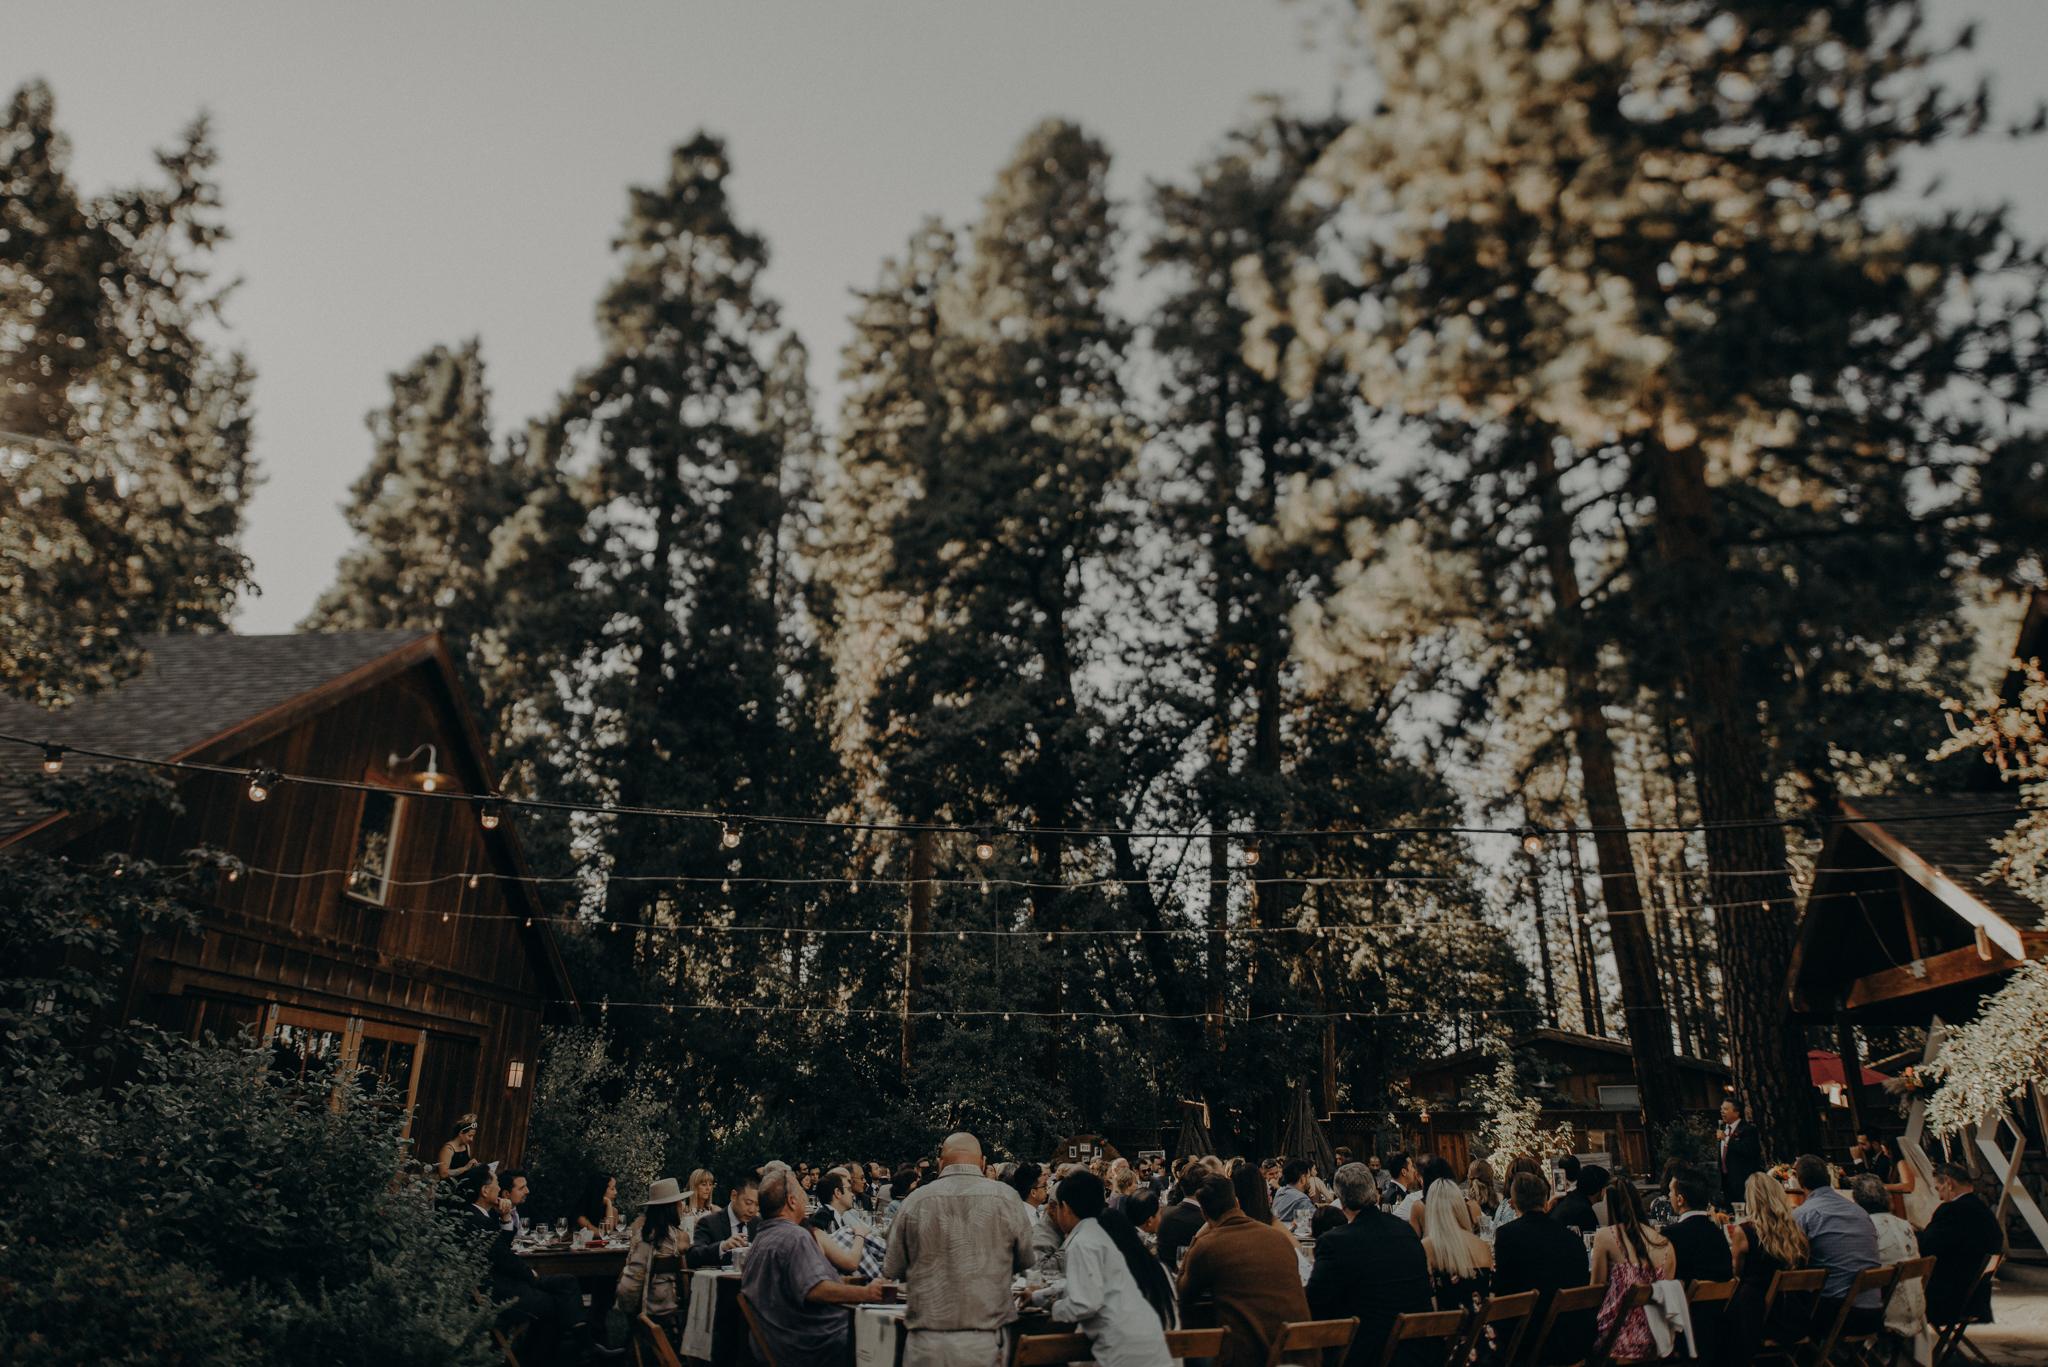 Yosemite Elopement Photographer - Evergreen Lodge Wedding Photographer - IsaiahAndTaylor.com-123.jpg